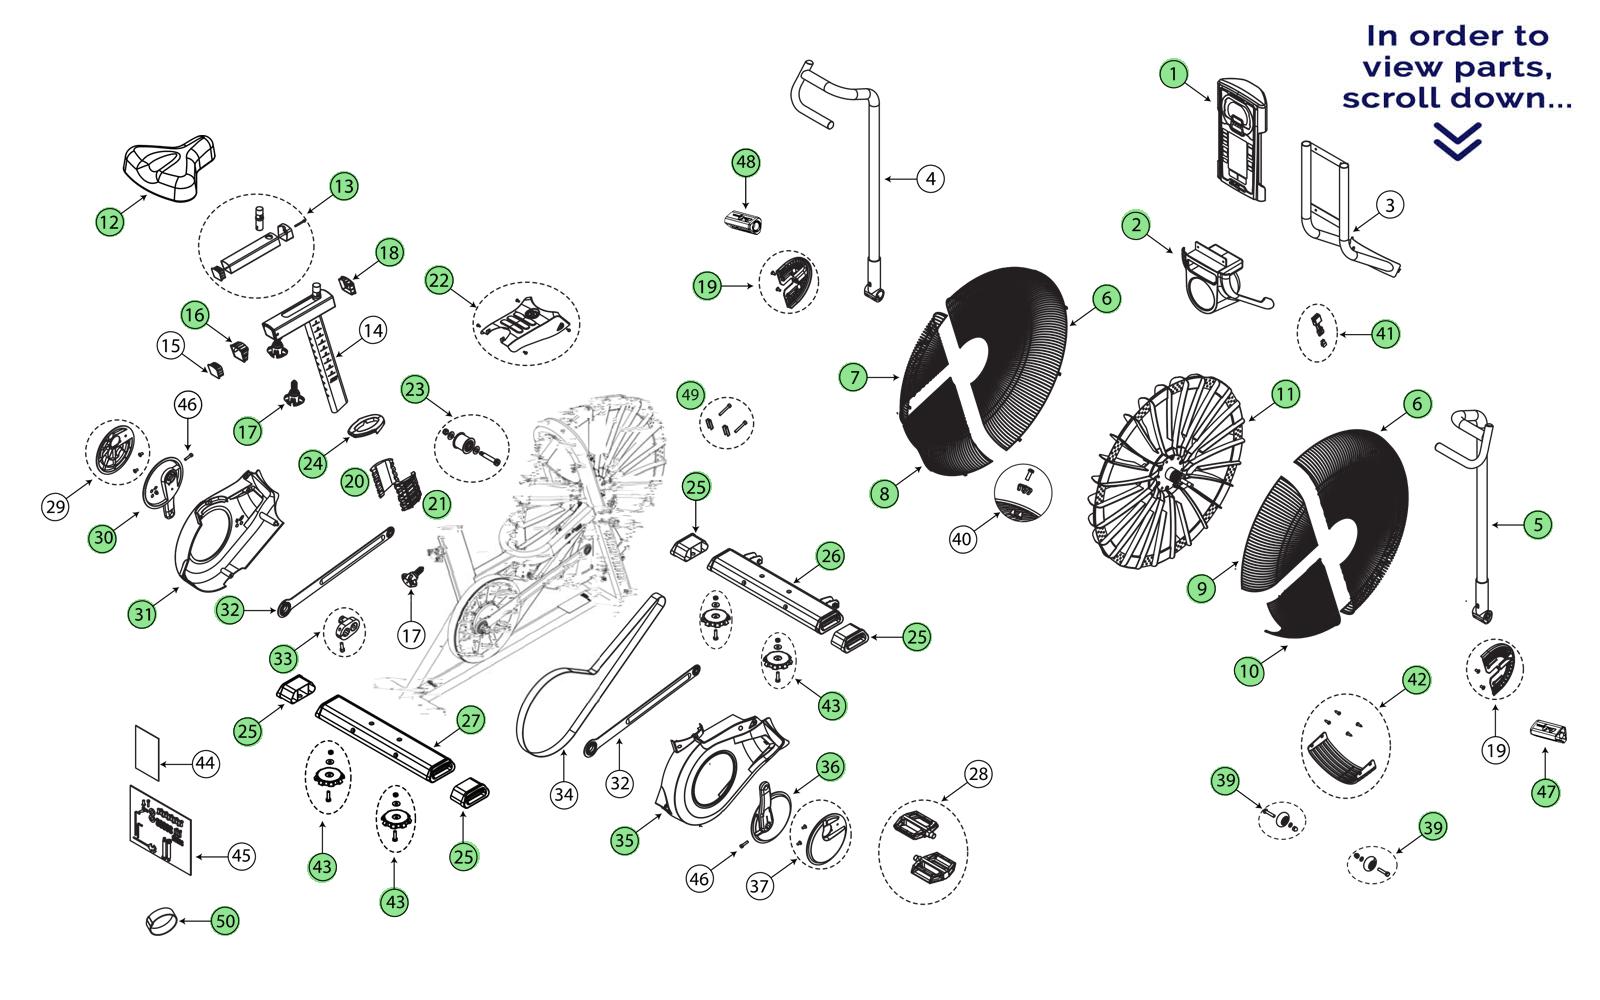 bike parts diagram transbrake wiring schwinn airdyne exercise manual best seller